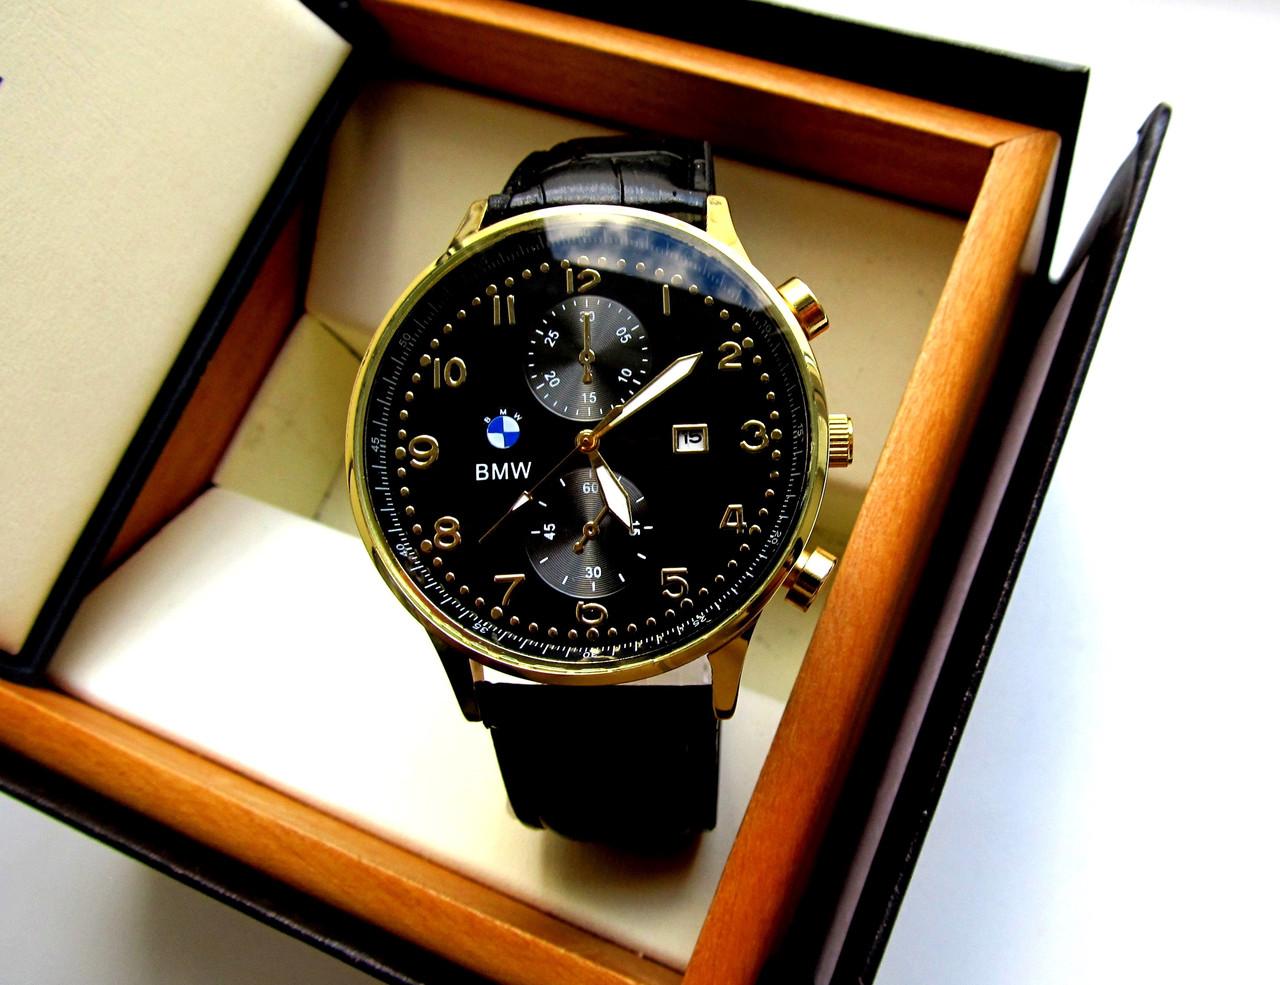 d5416db8 Мужские наручные часы BMW. Мужские часы. Наручные часы. Модные мужские часы